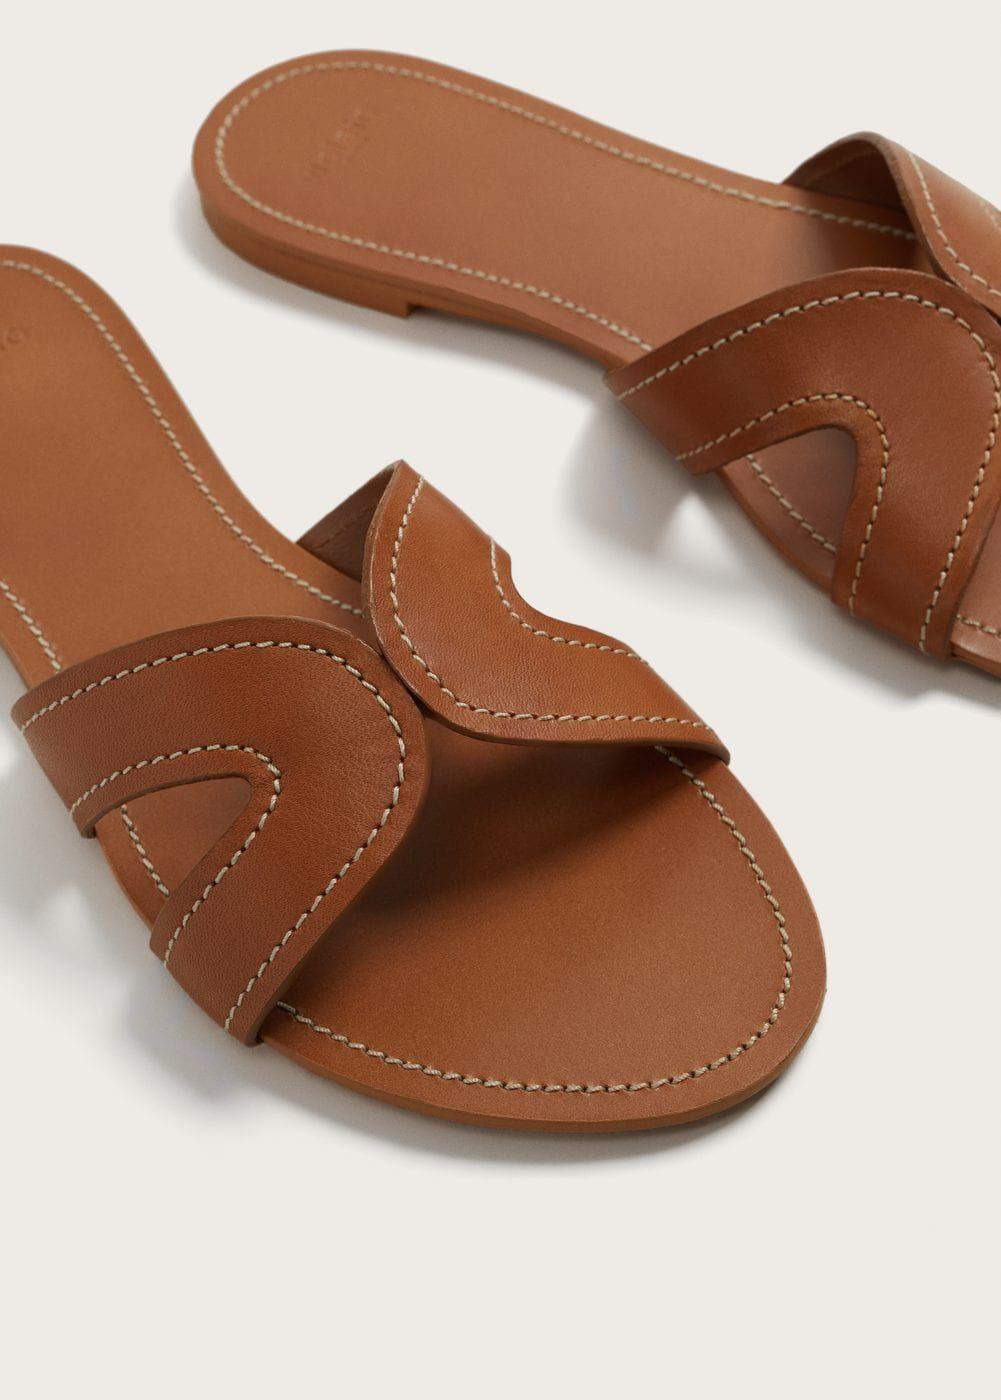 Mode I Stora Storlekar For Damer Leather Sandals Handmade Shoes Flats Sandals Leather Slippers